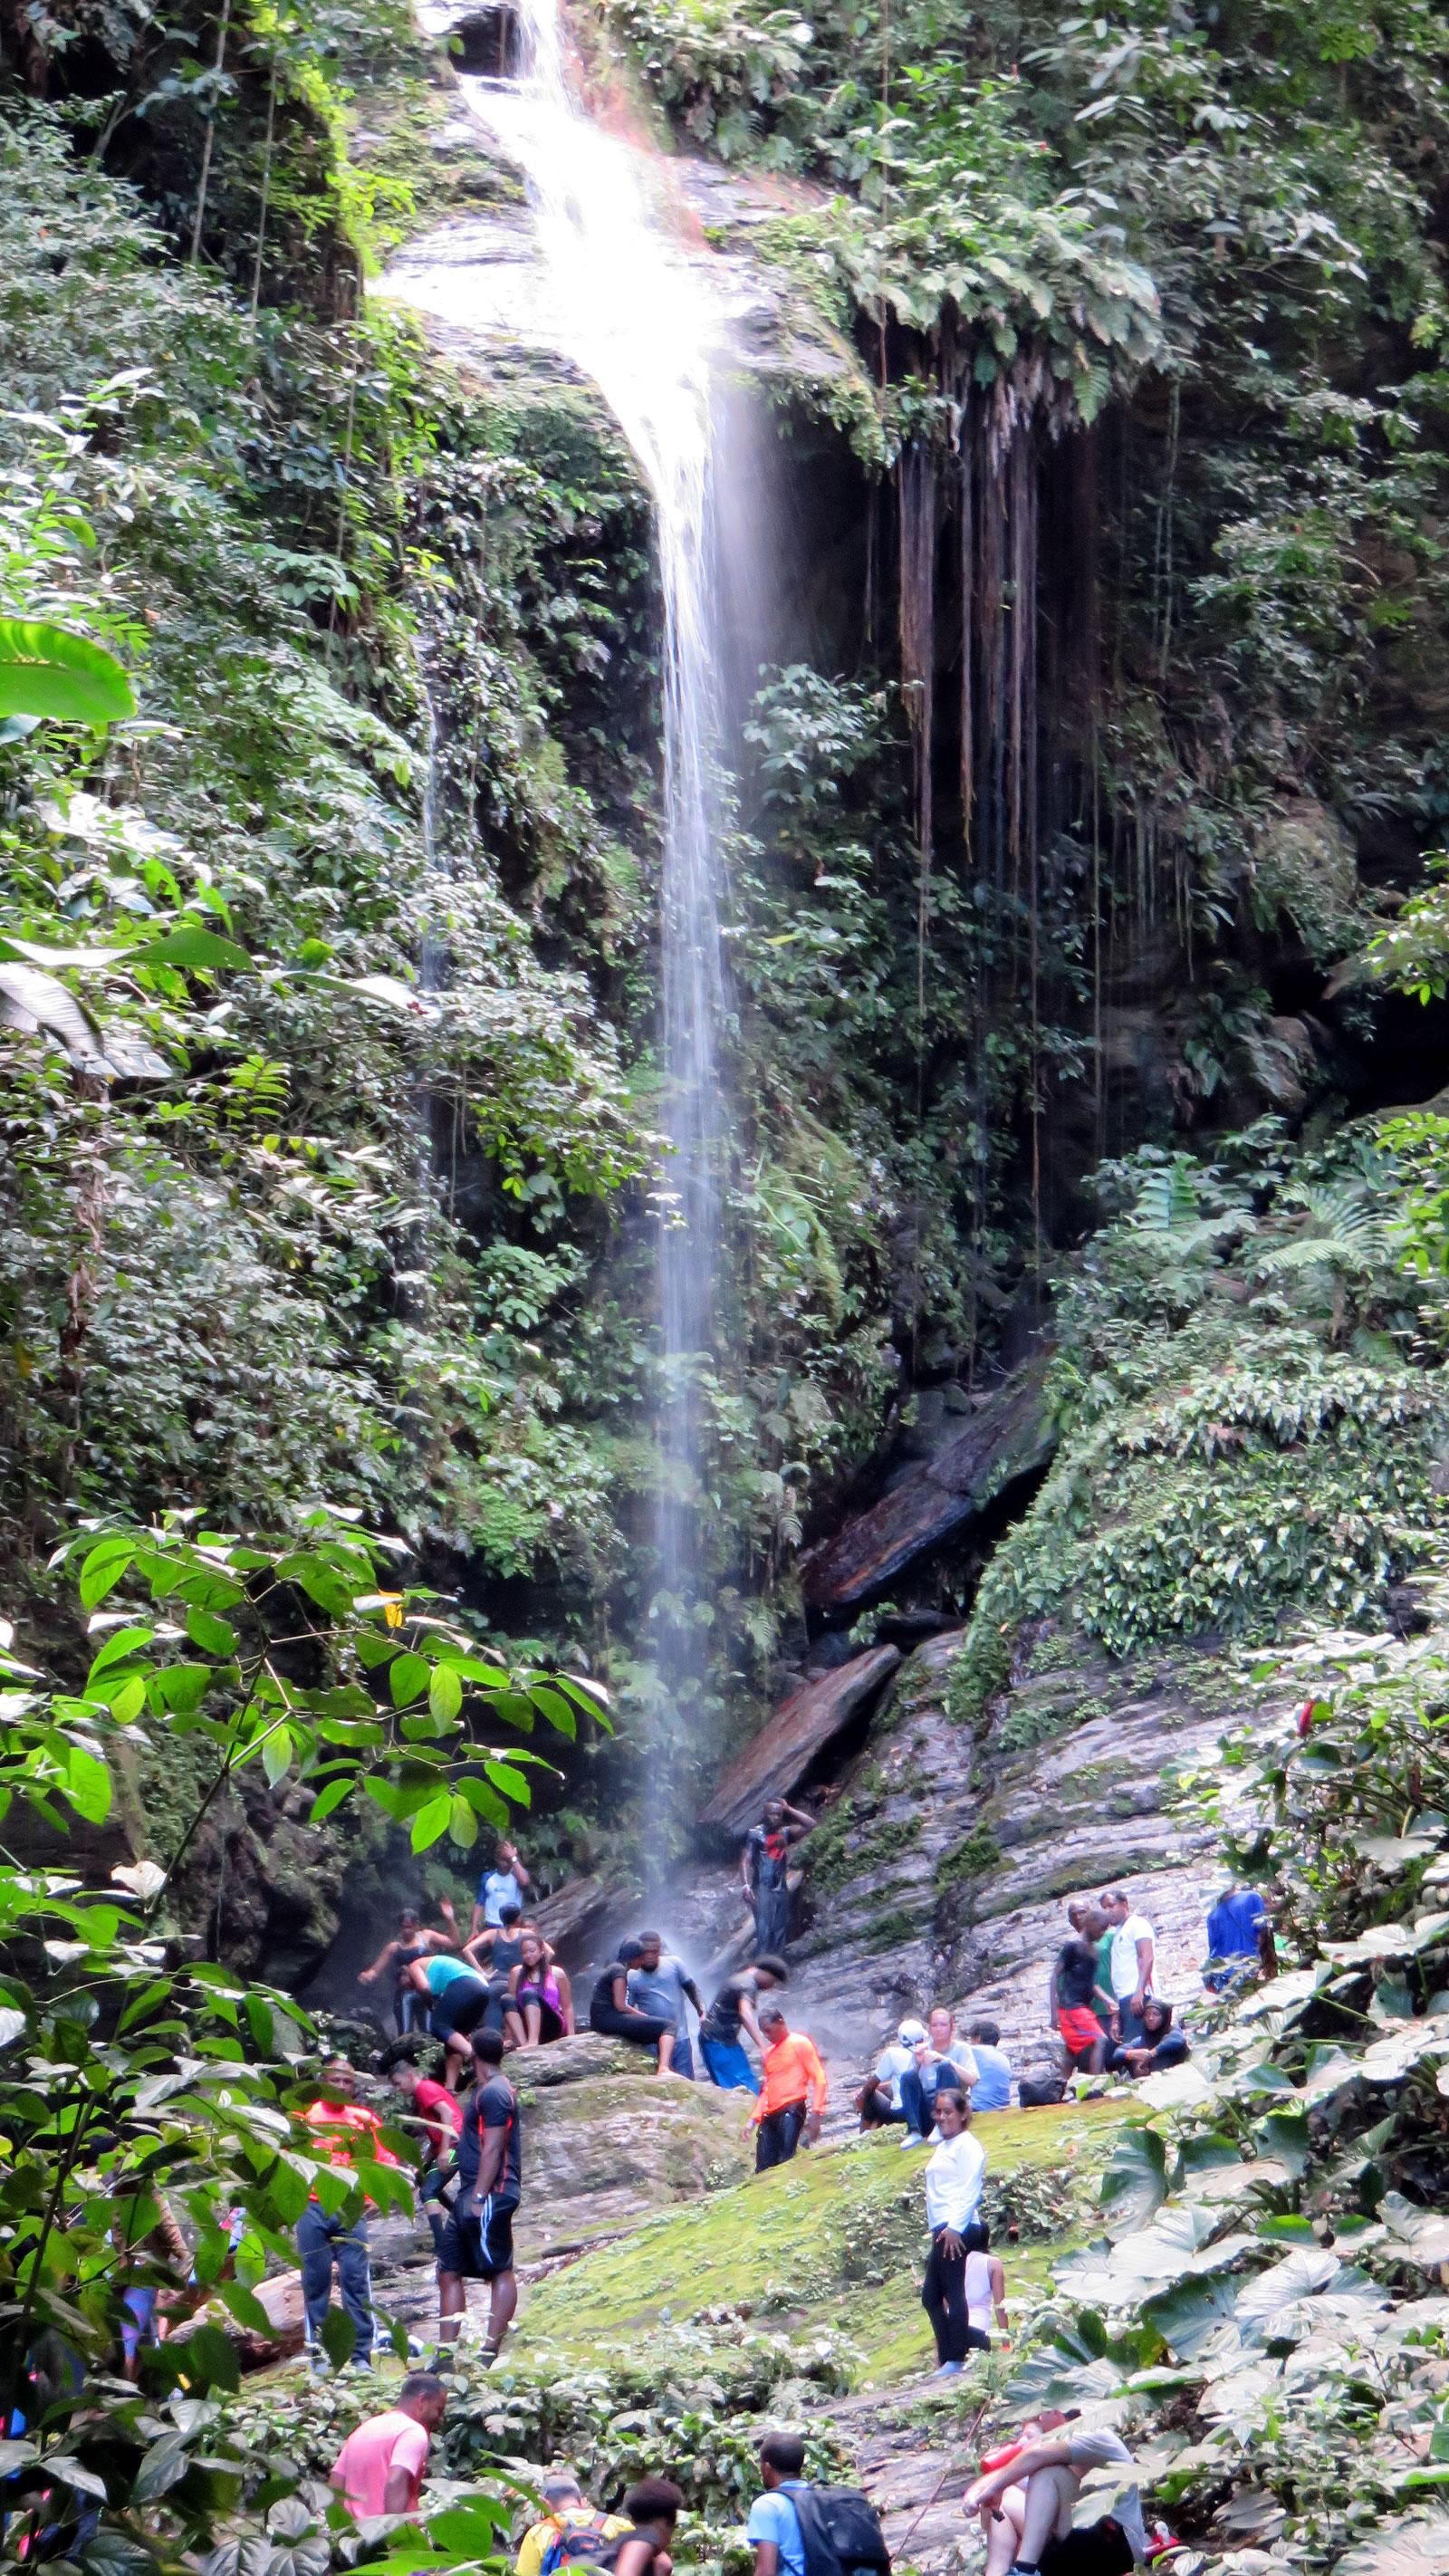 Angel Falls Destination Trinidad And Tobago Tours